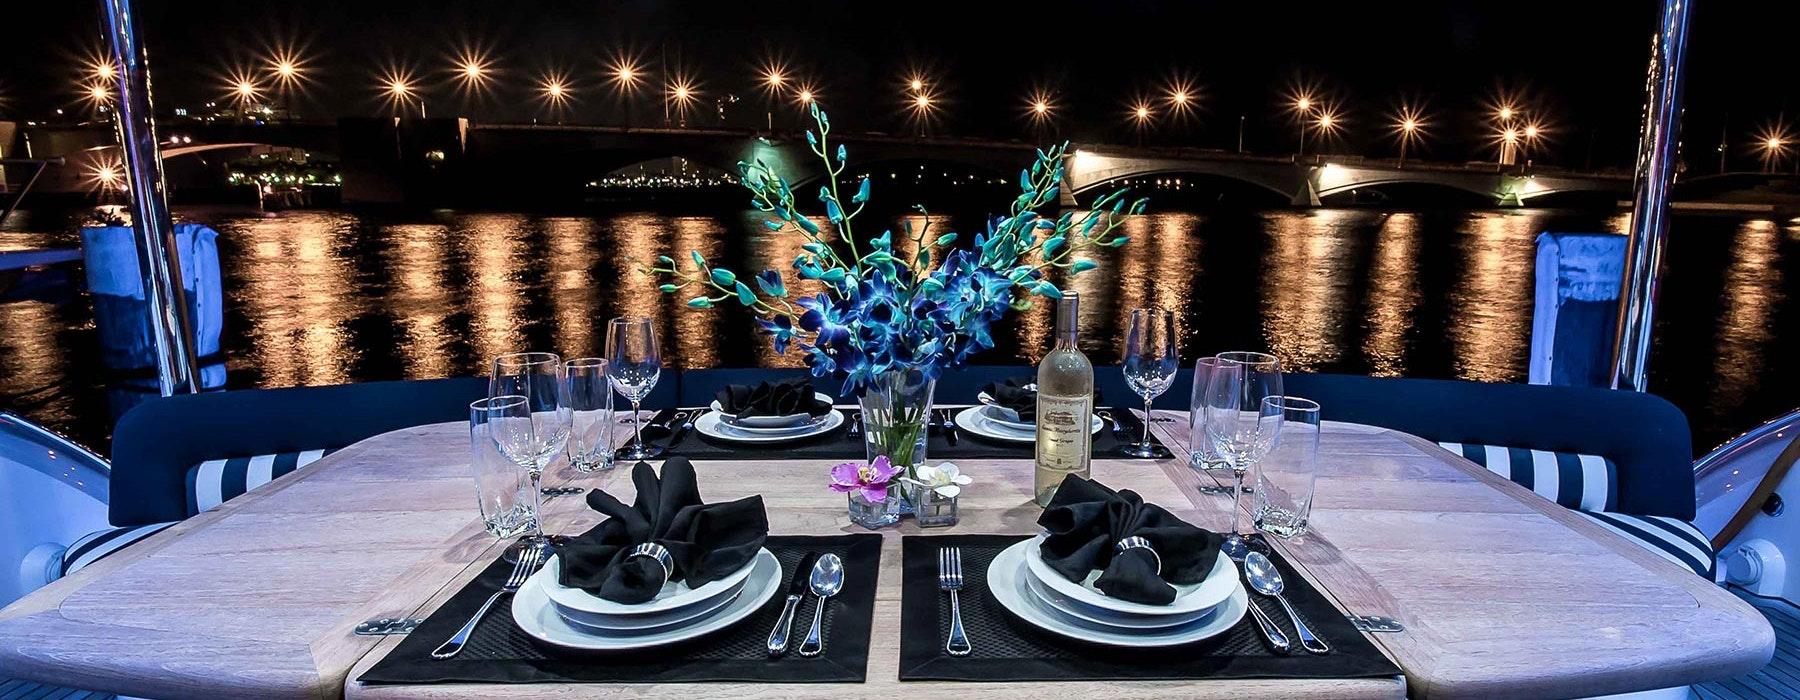 Sunseeker Luxury Yacht ALAINA Price Reduction